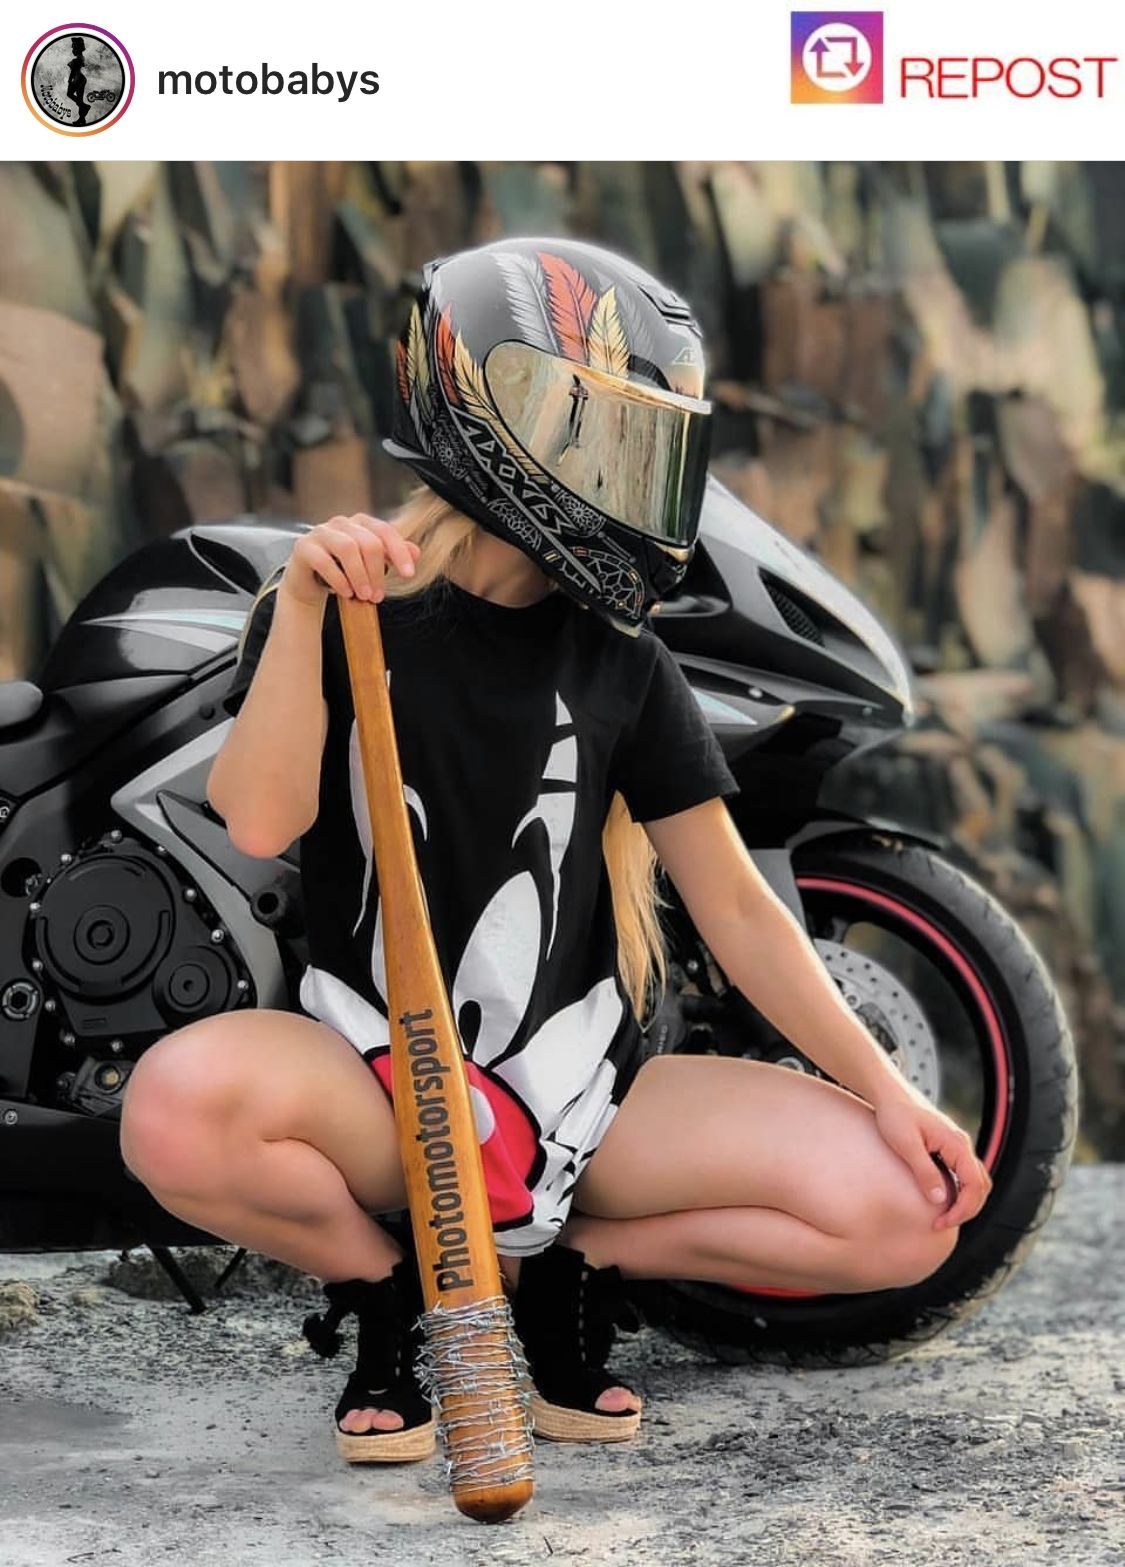 Girls on bike (motorcycle) girls biker